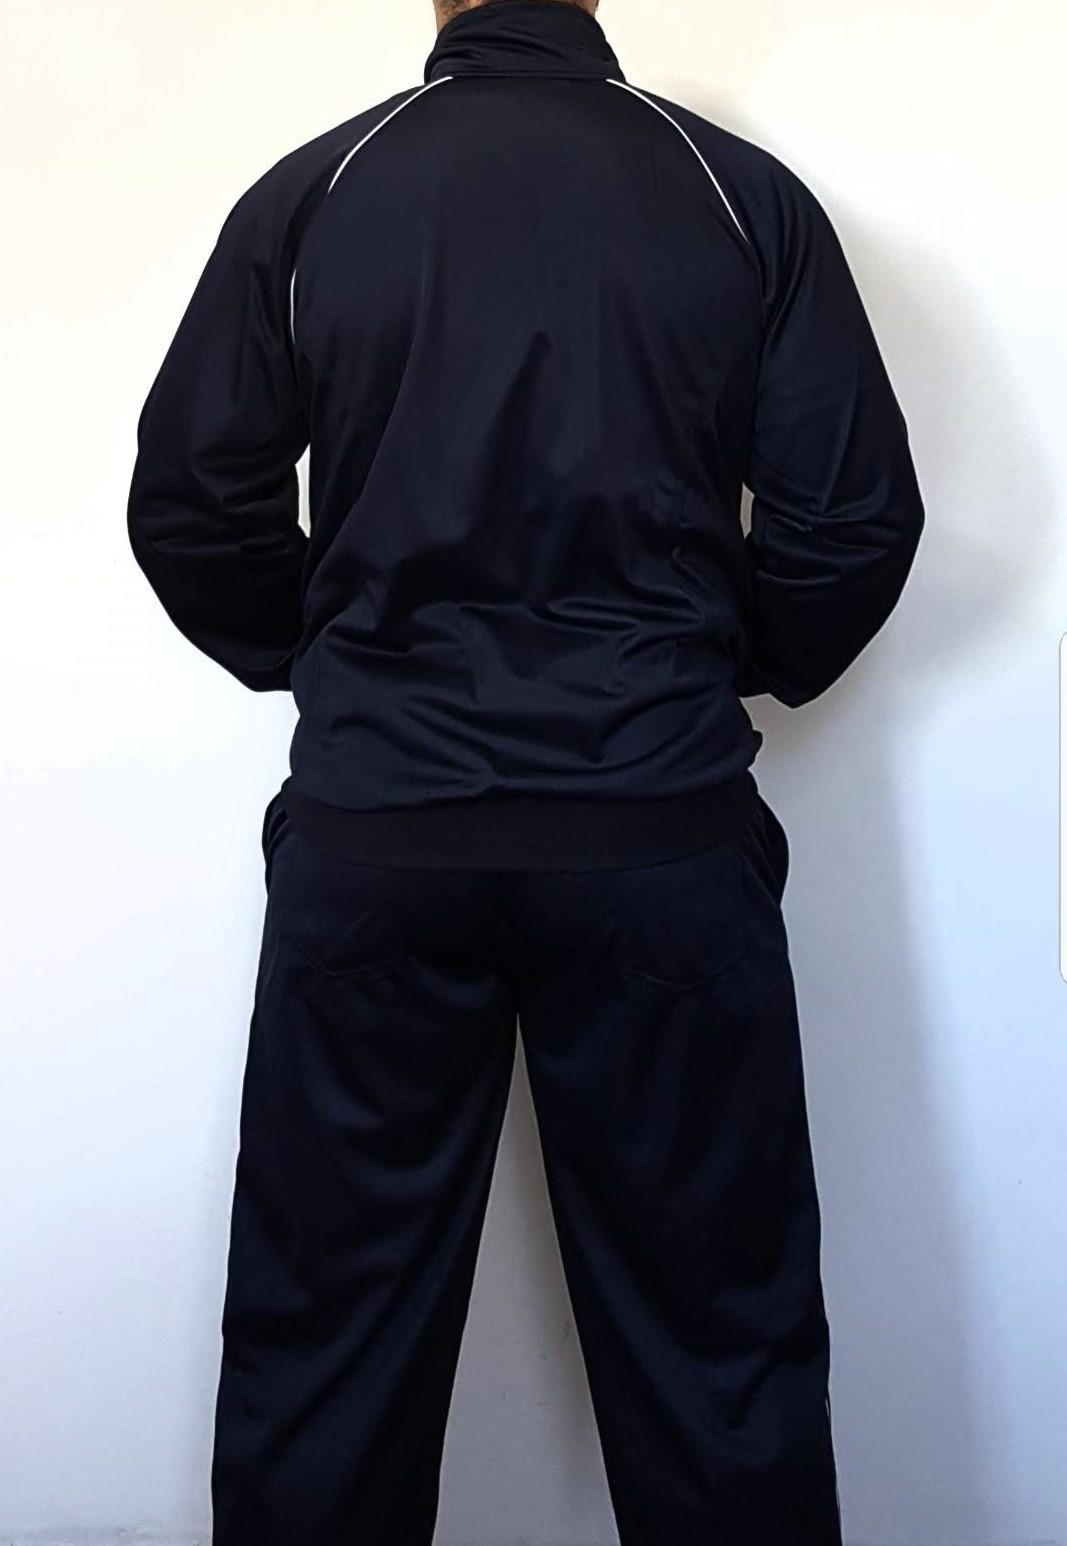 Agasalho Jiu Jitsu Bjj Martial Arts Shodo nas cores: Preto ou Azul escuro